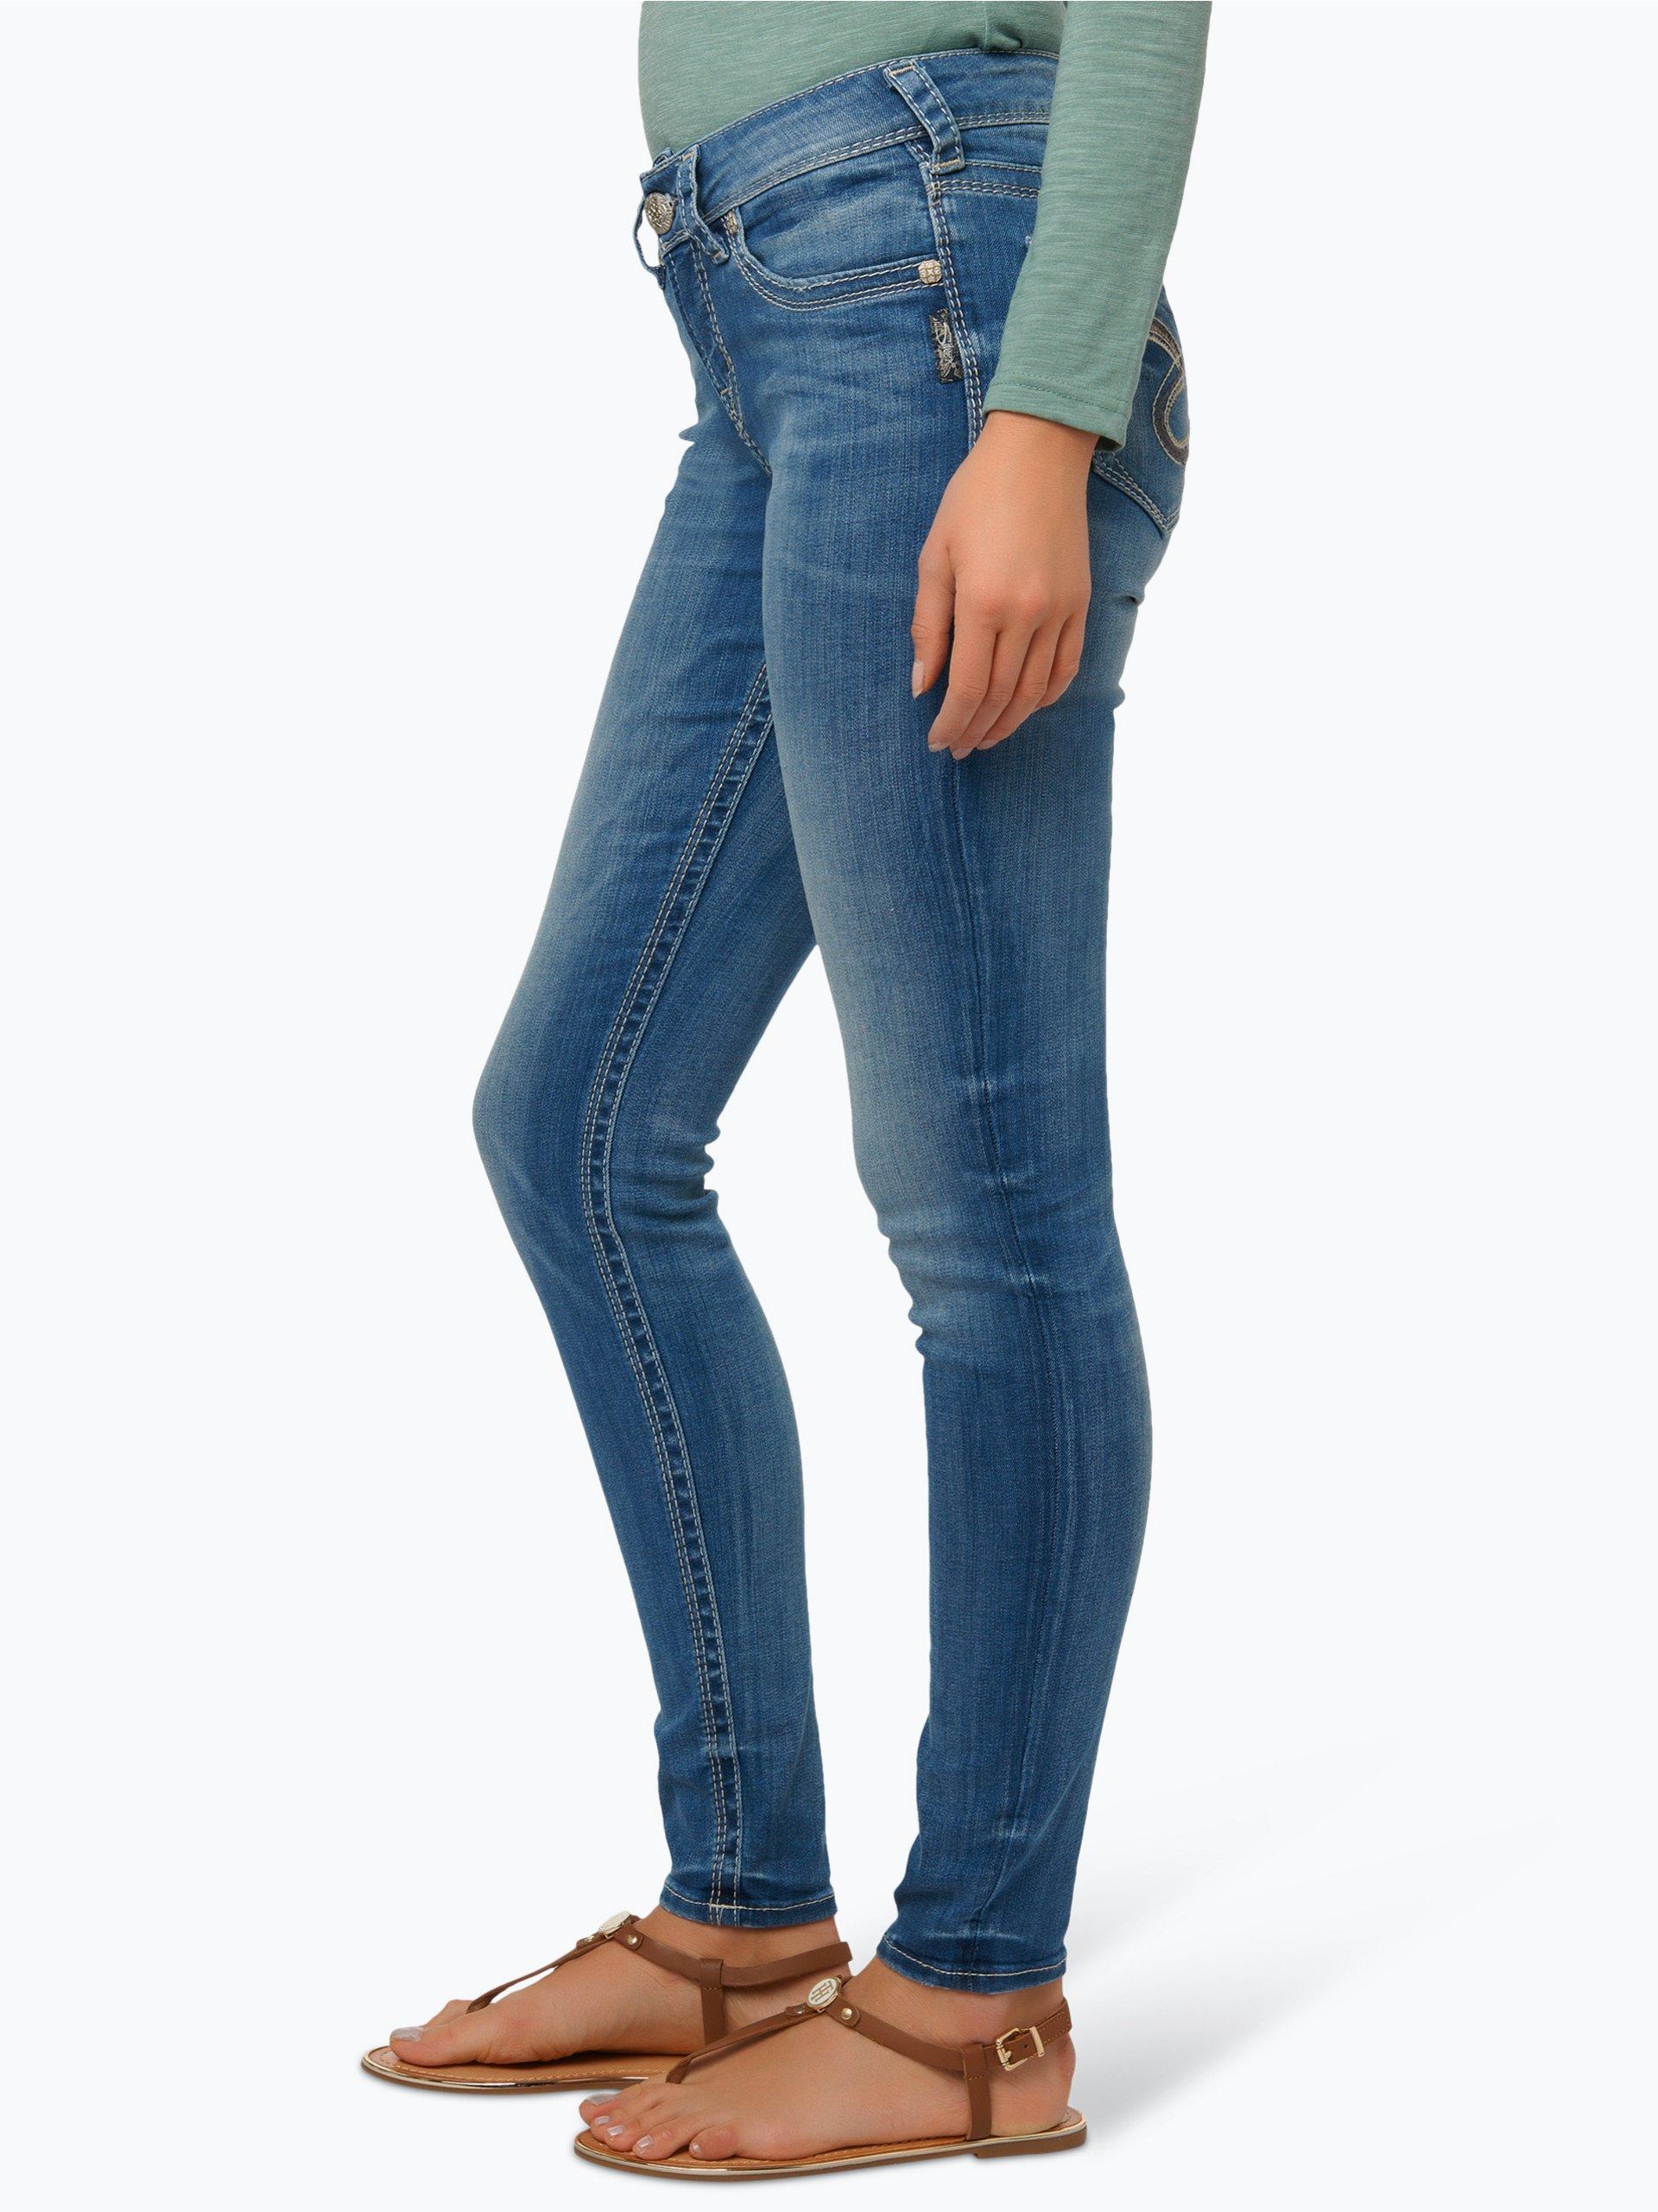 silver jeans damen jeans suki 2 online kaufen peek und cloppenburg de. Black Bedroom Furniture Sets. Home Design Ideas